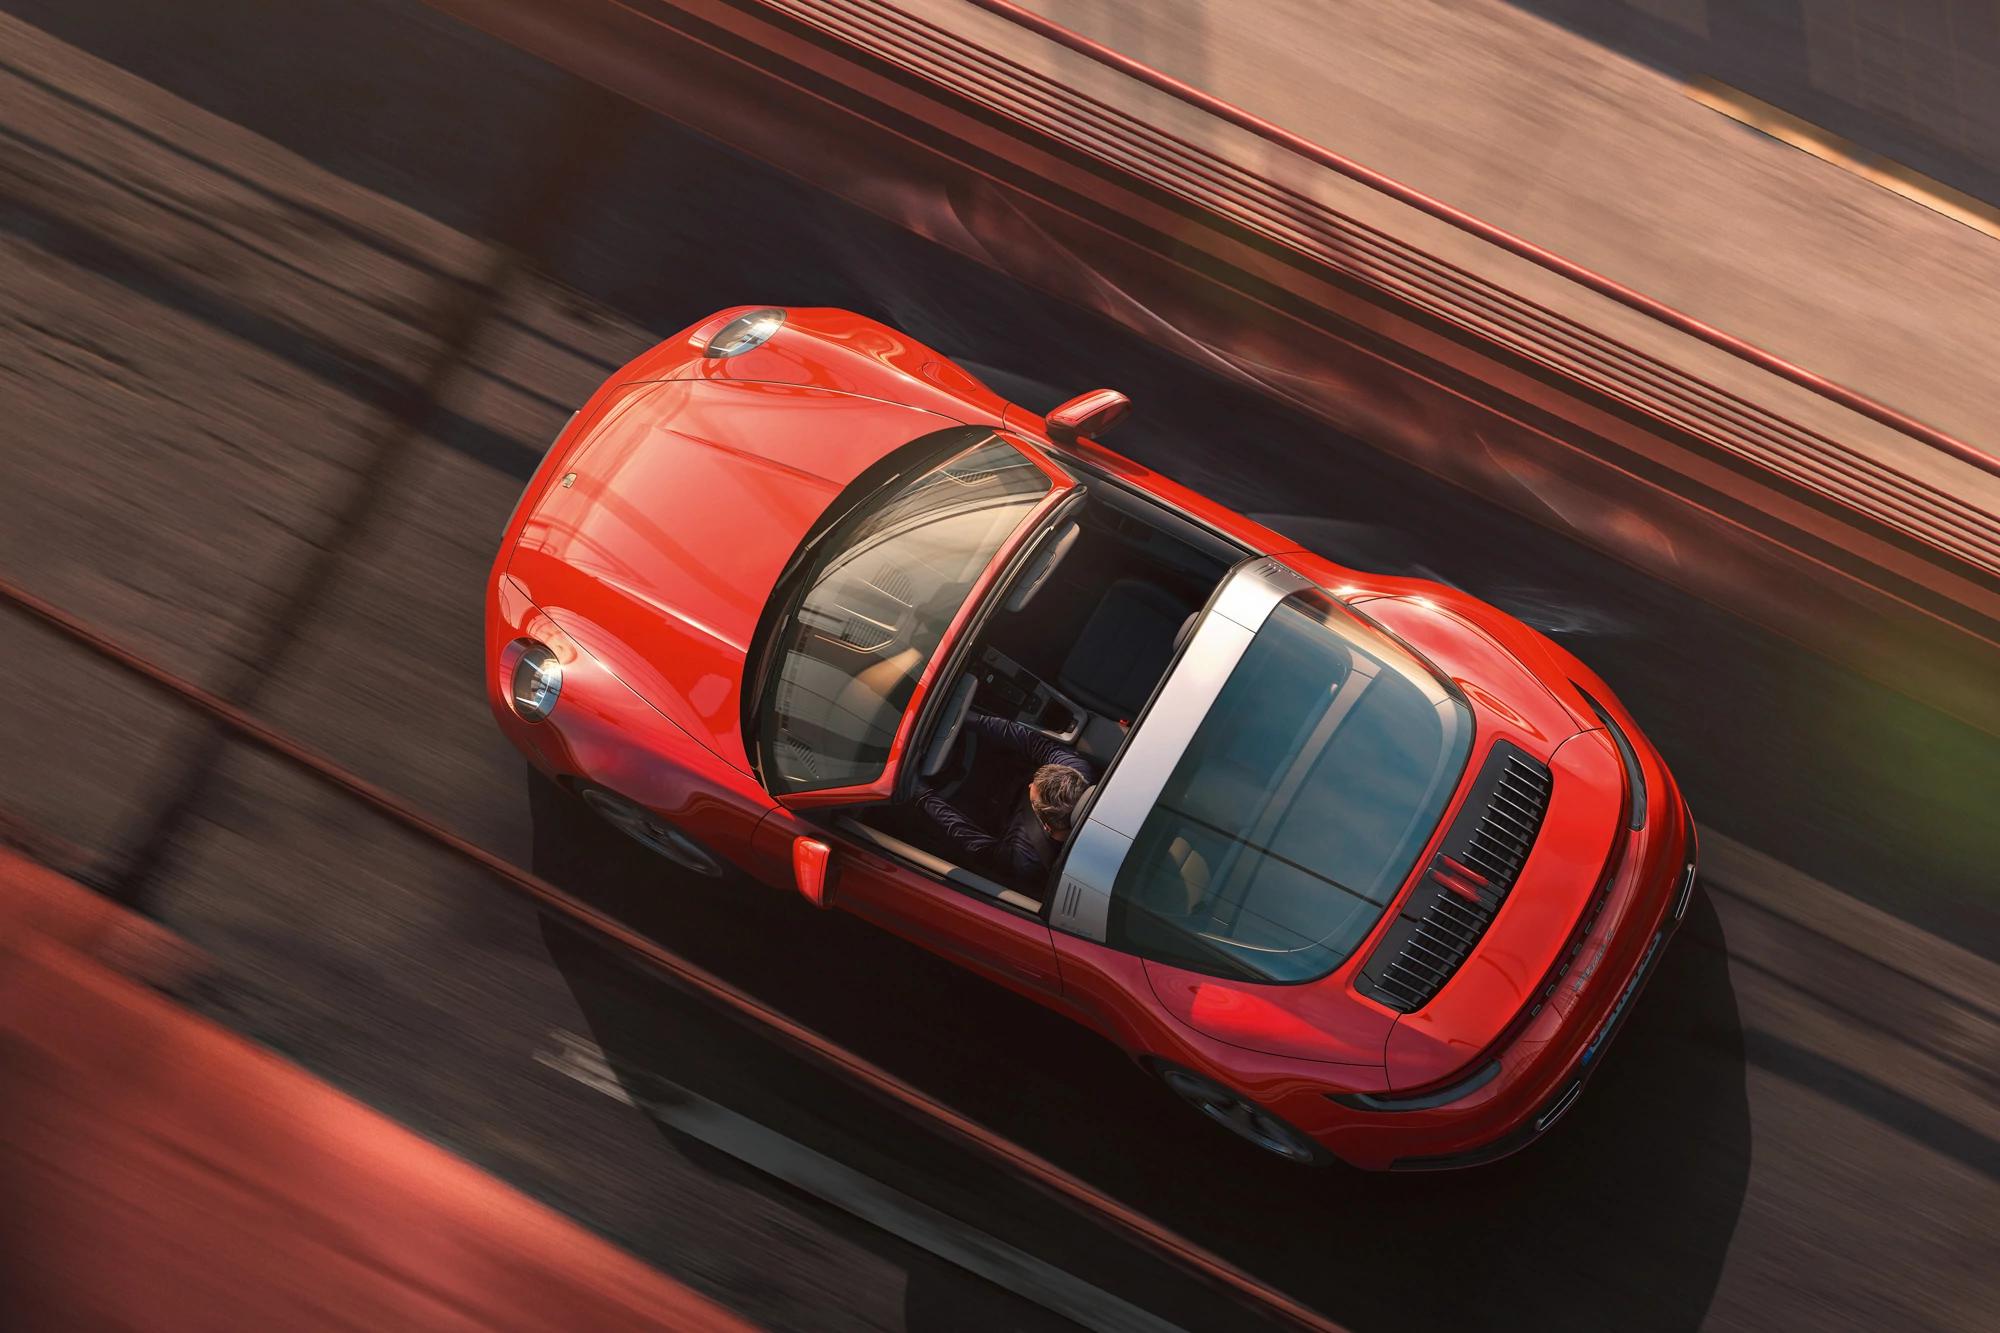 Porsche 911 Targa 4 and 4S Keep Retro Looks for New Generation